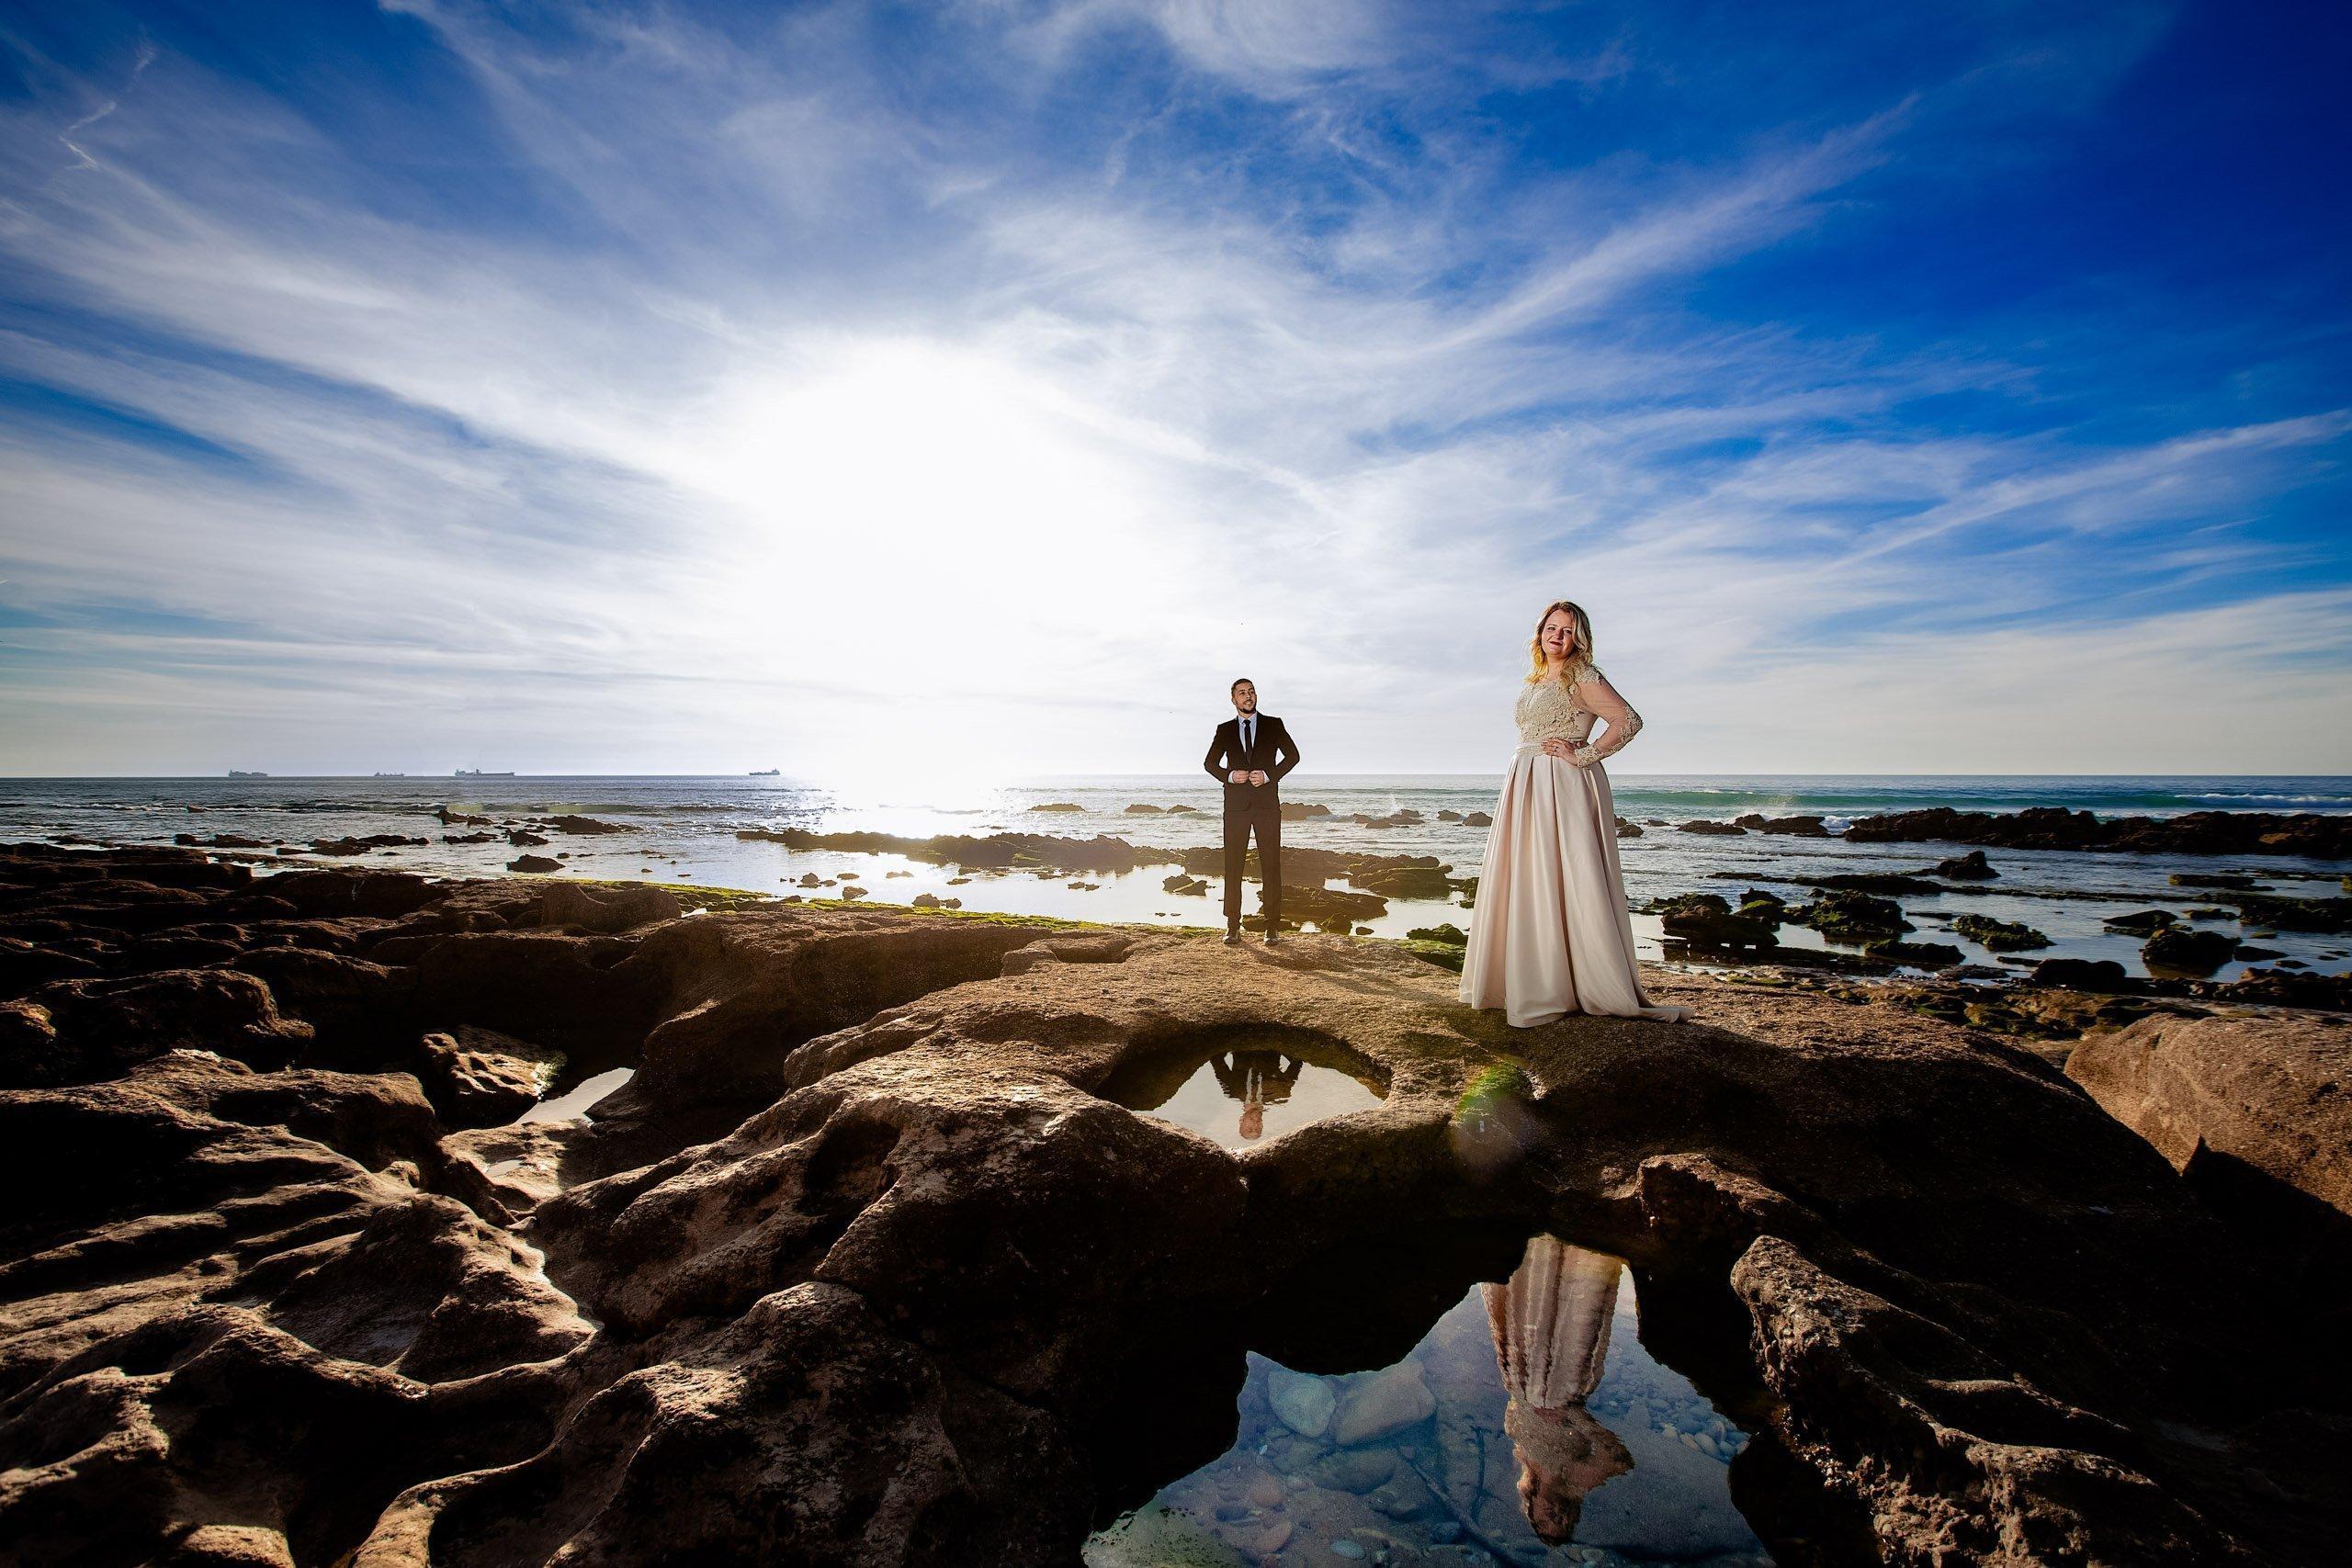 Post wedding photoshoot on Agadir's beach.